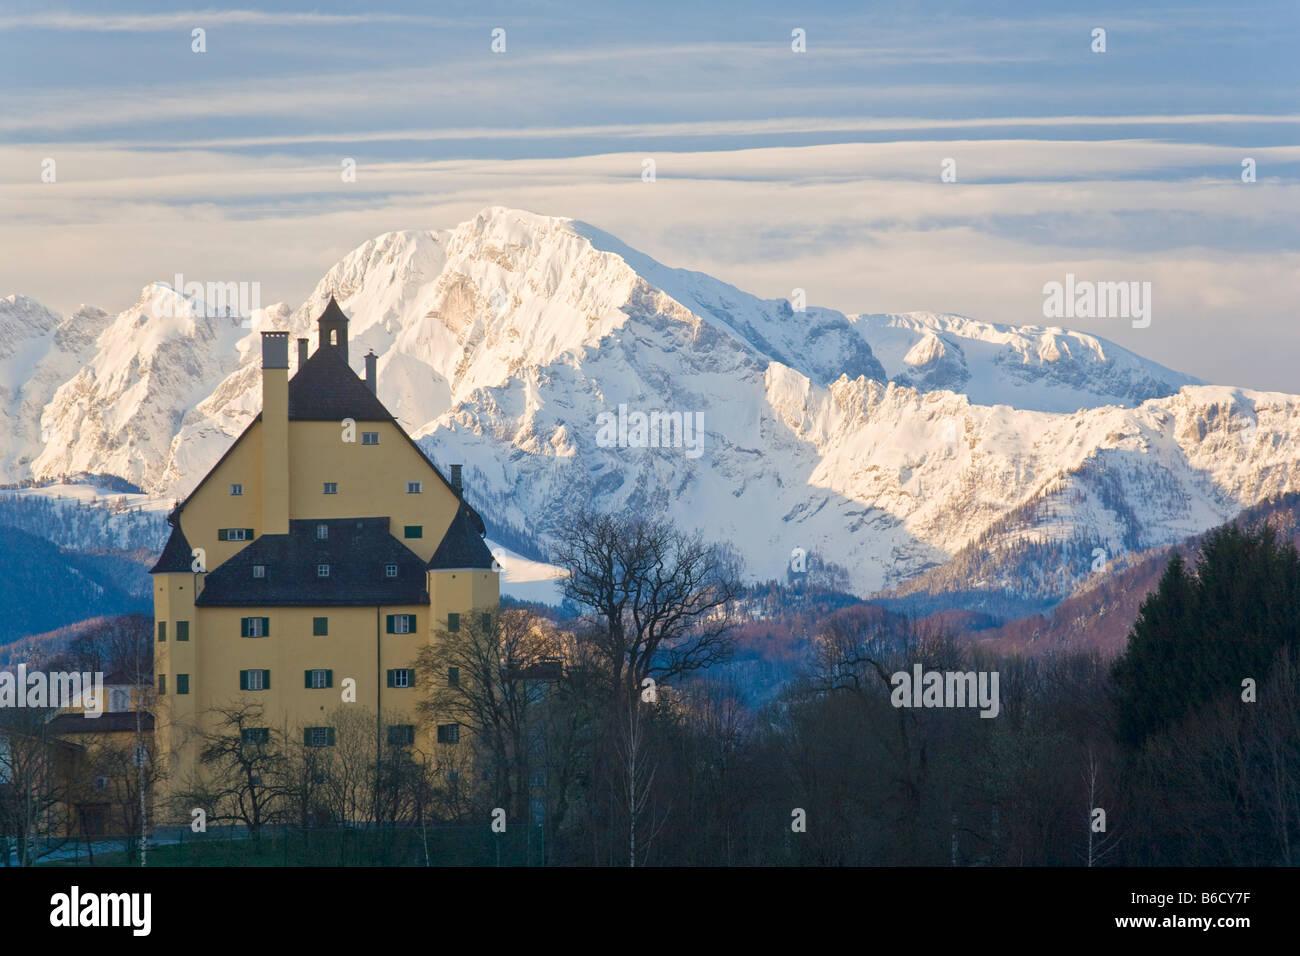 Palace surrounded by trees, Schloss Goldenstein, Elsbethen, Flachgau, Hoher Goell, Berchtesgaden Alps, Salzburg, Stock Photo